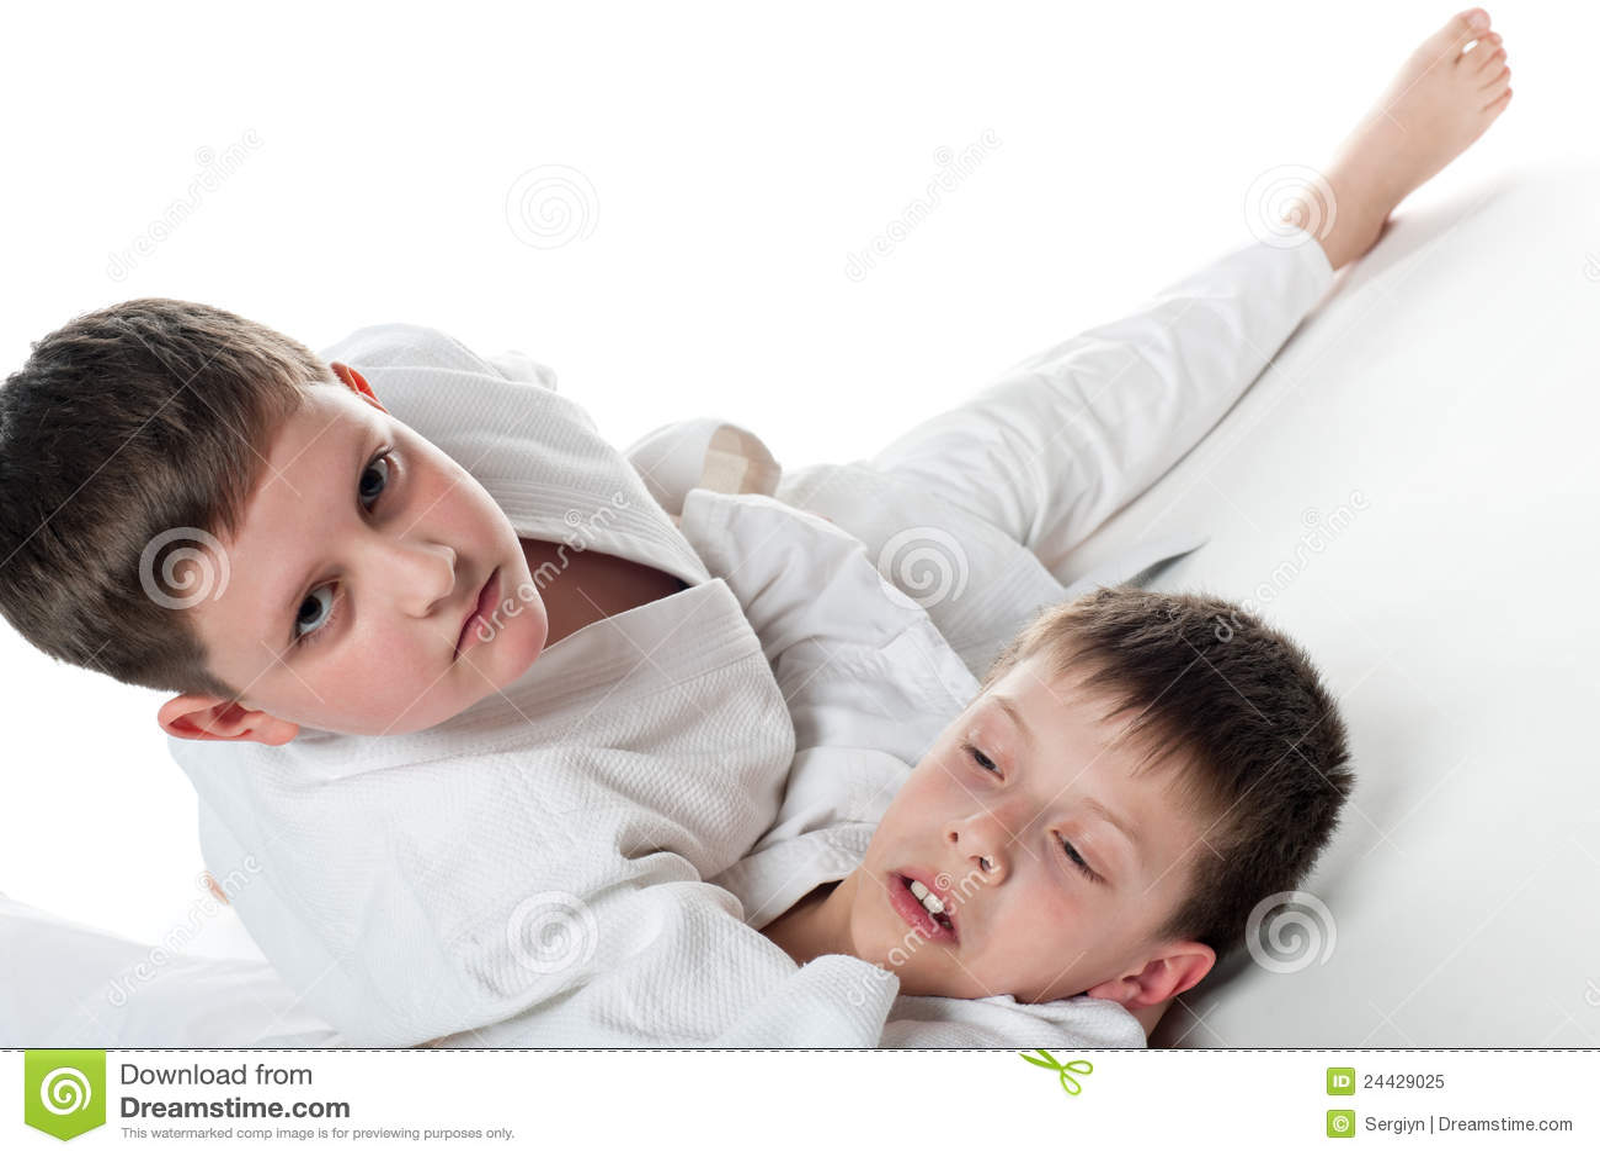 Kids Wrestling Royalty Free Stock Photo